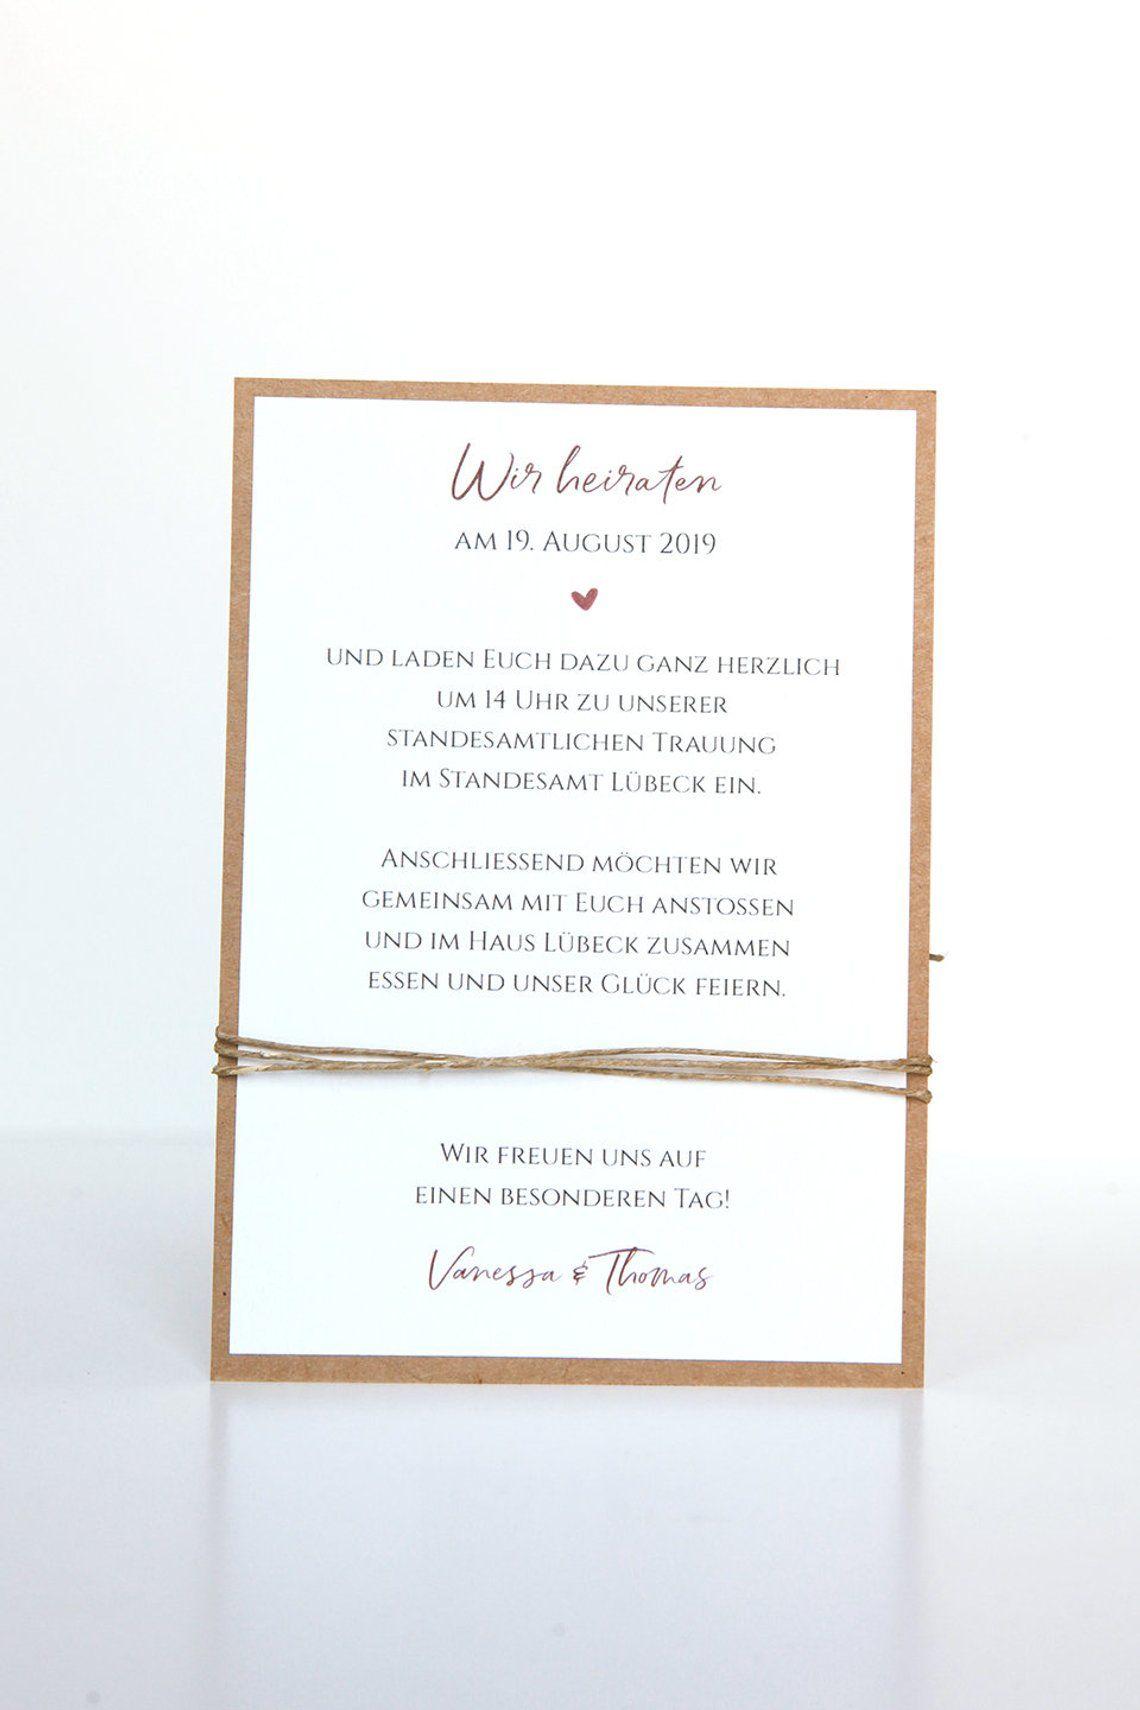 Wedding invitations, wedding invitations, wedding cards